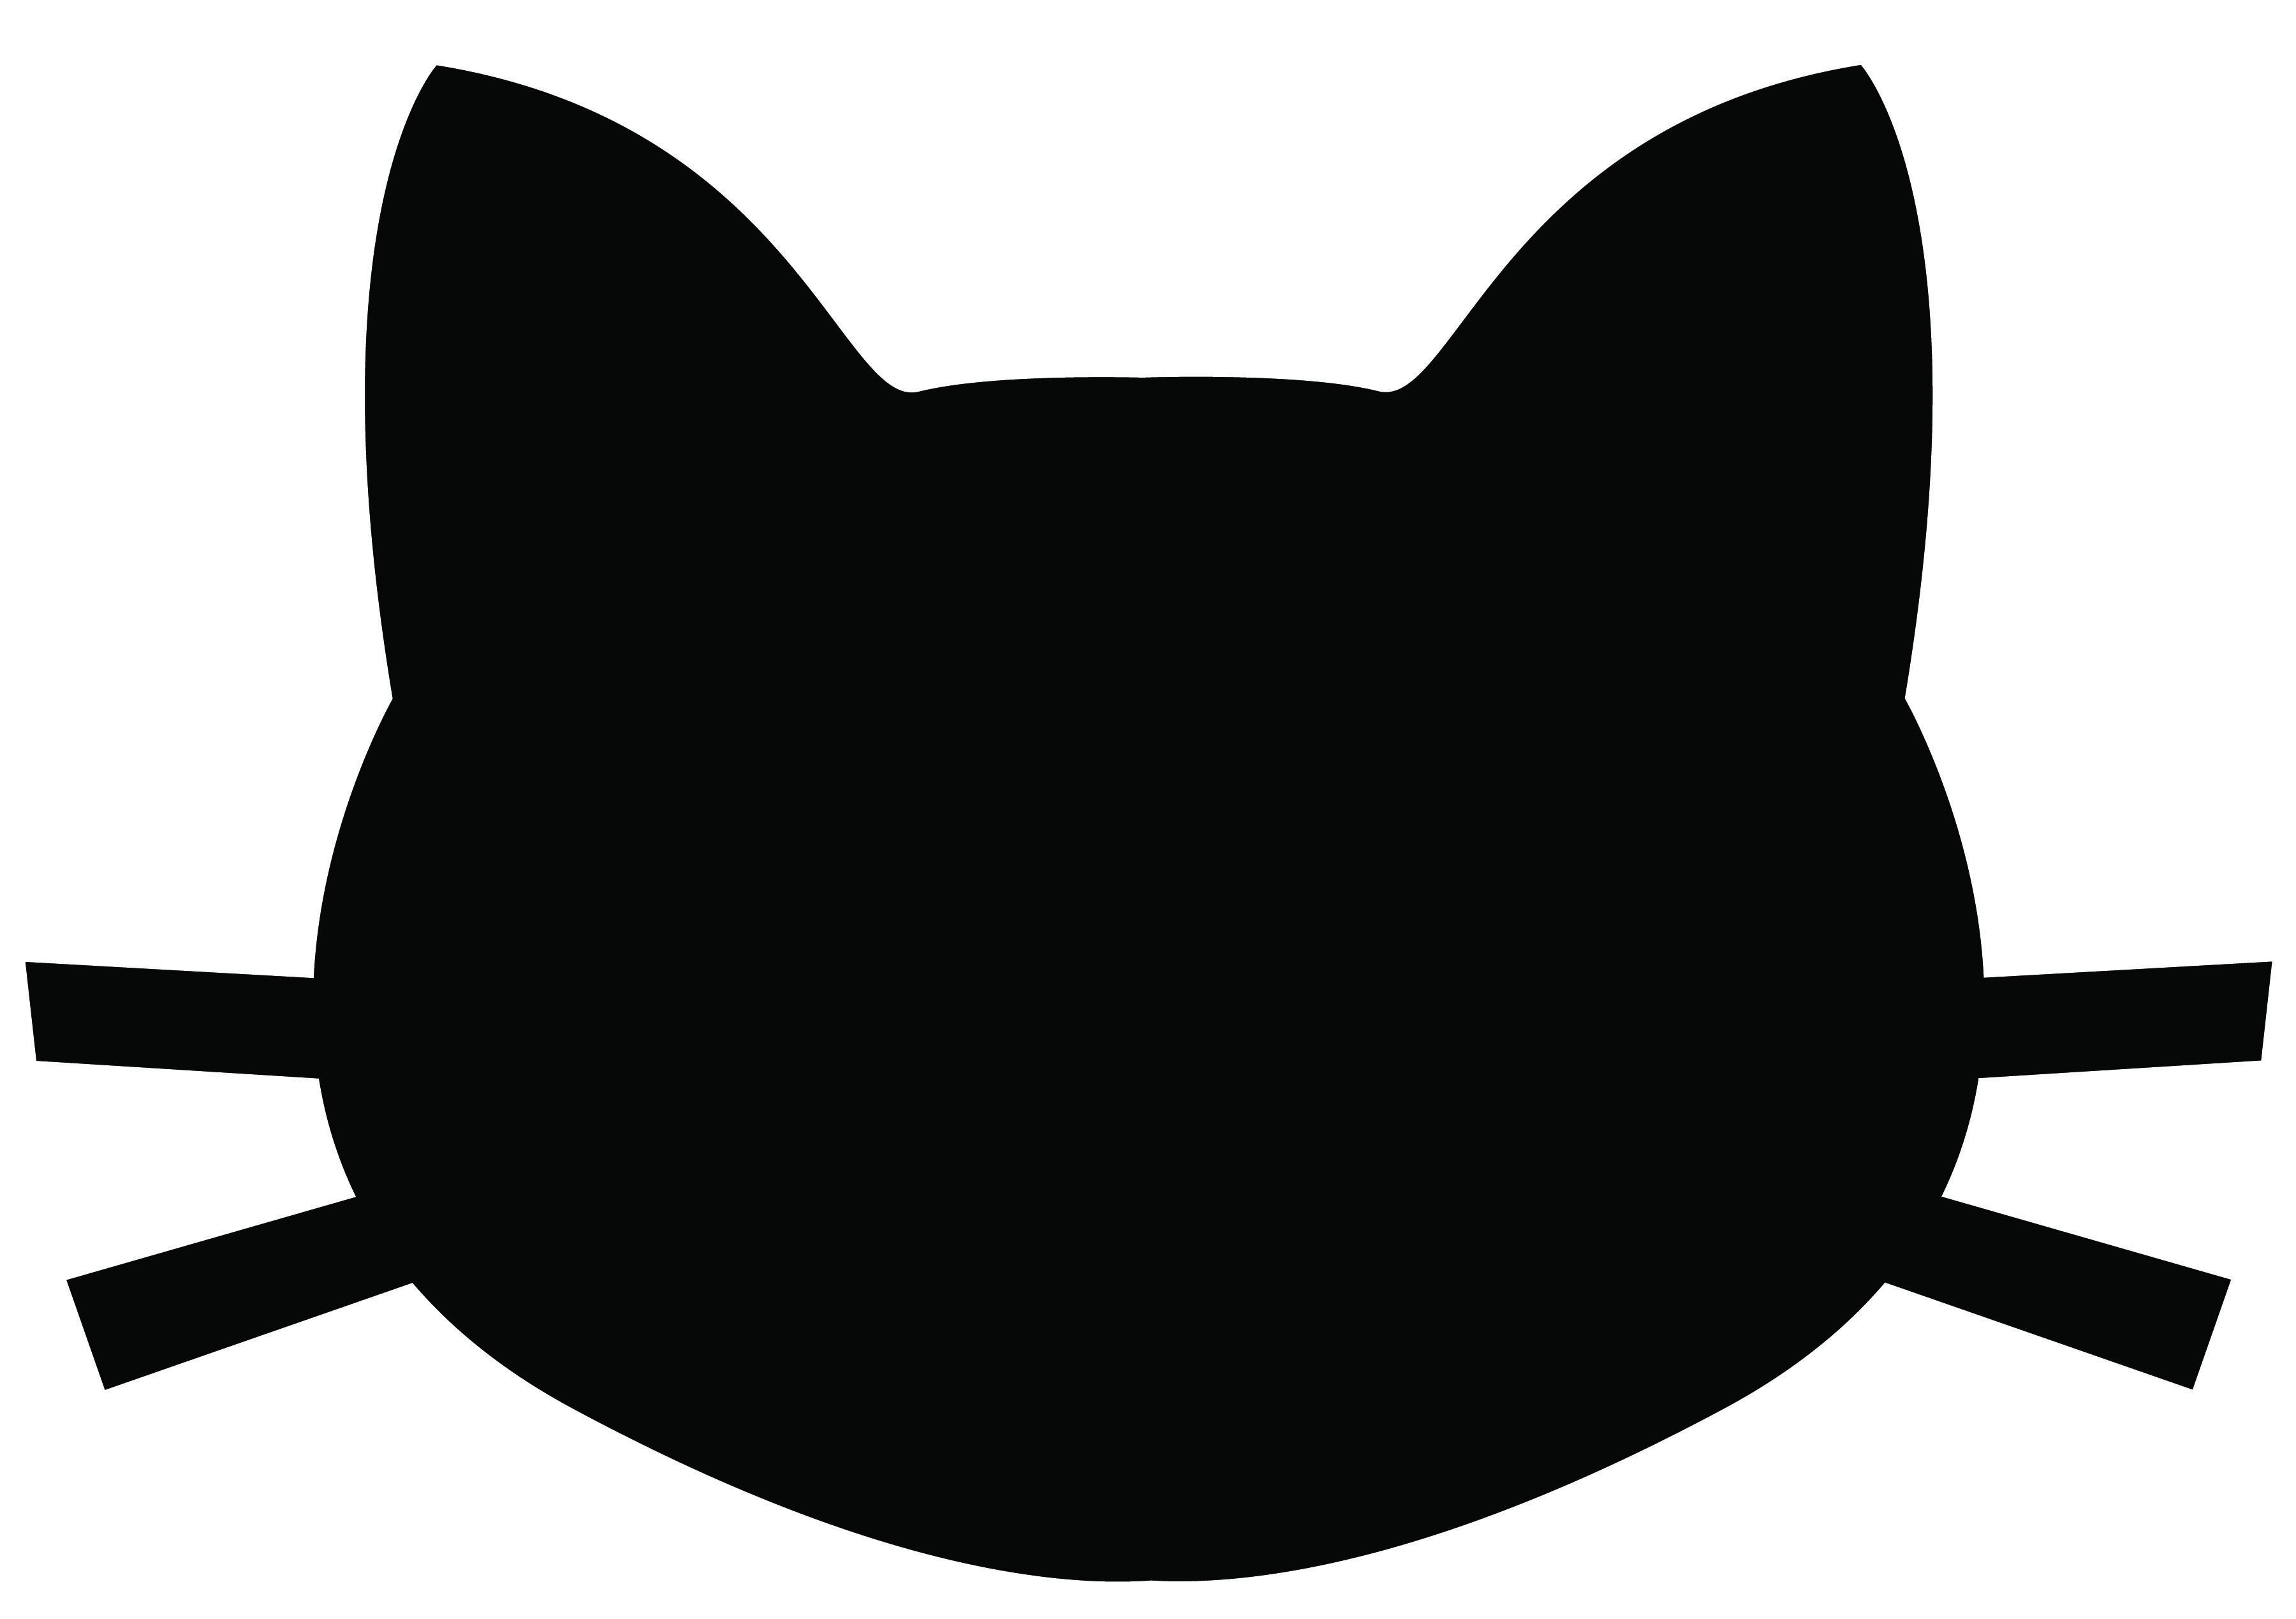 3600x2538 Cat Head Silhouette